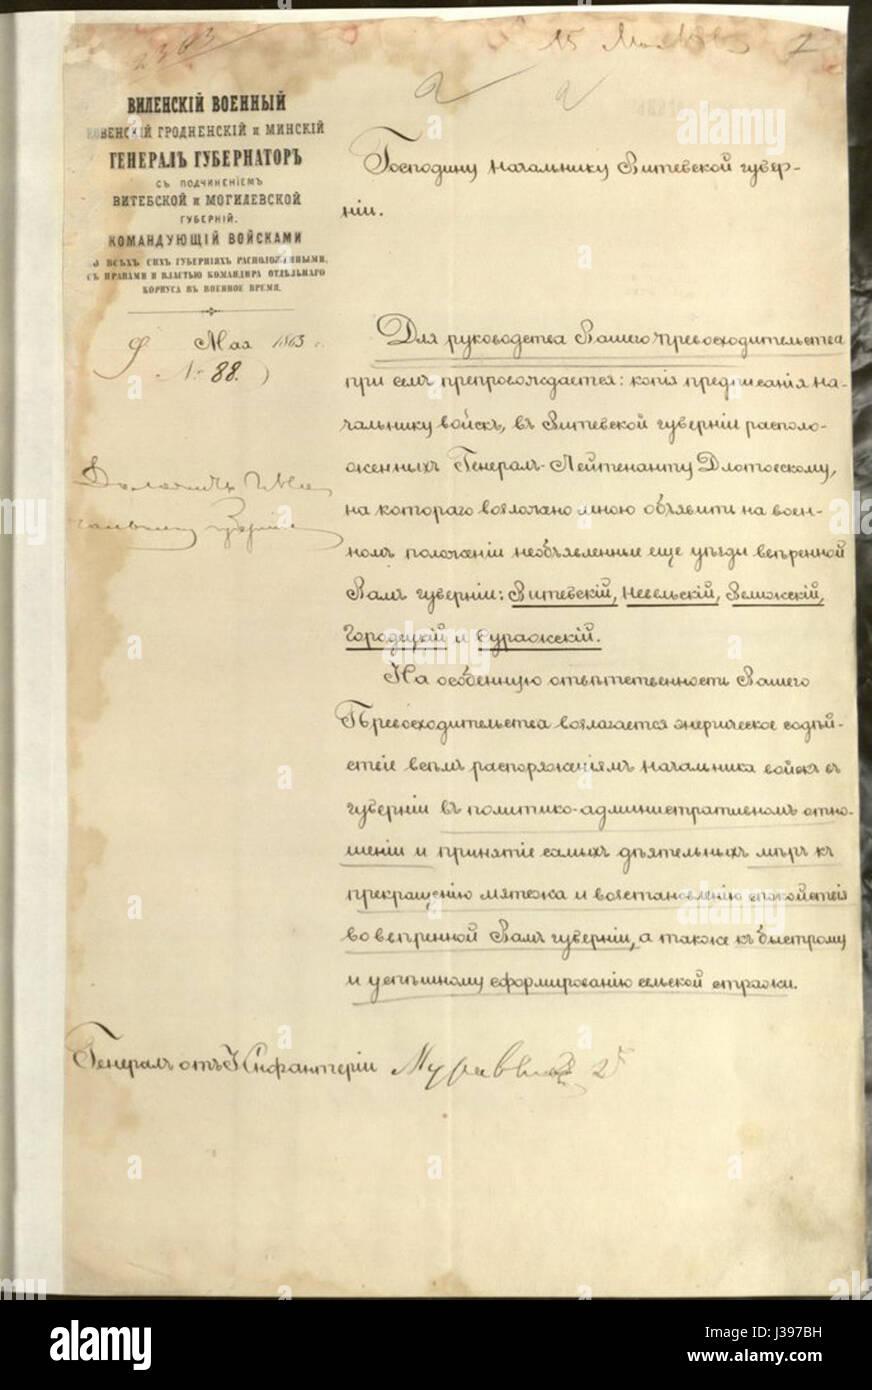 Decree of the Vilno General Governor Mikhail Nikolayevich Muravyov to Vitebsk Governor Alexander Ogolin   1863 AD - Stock Image